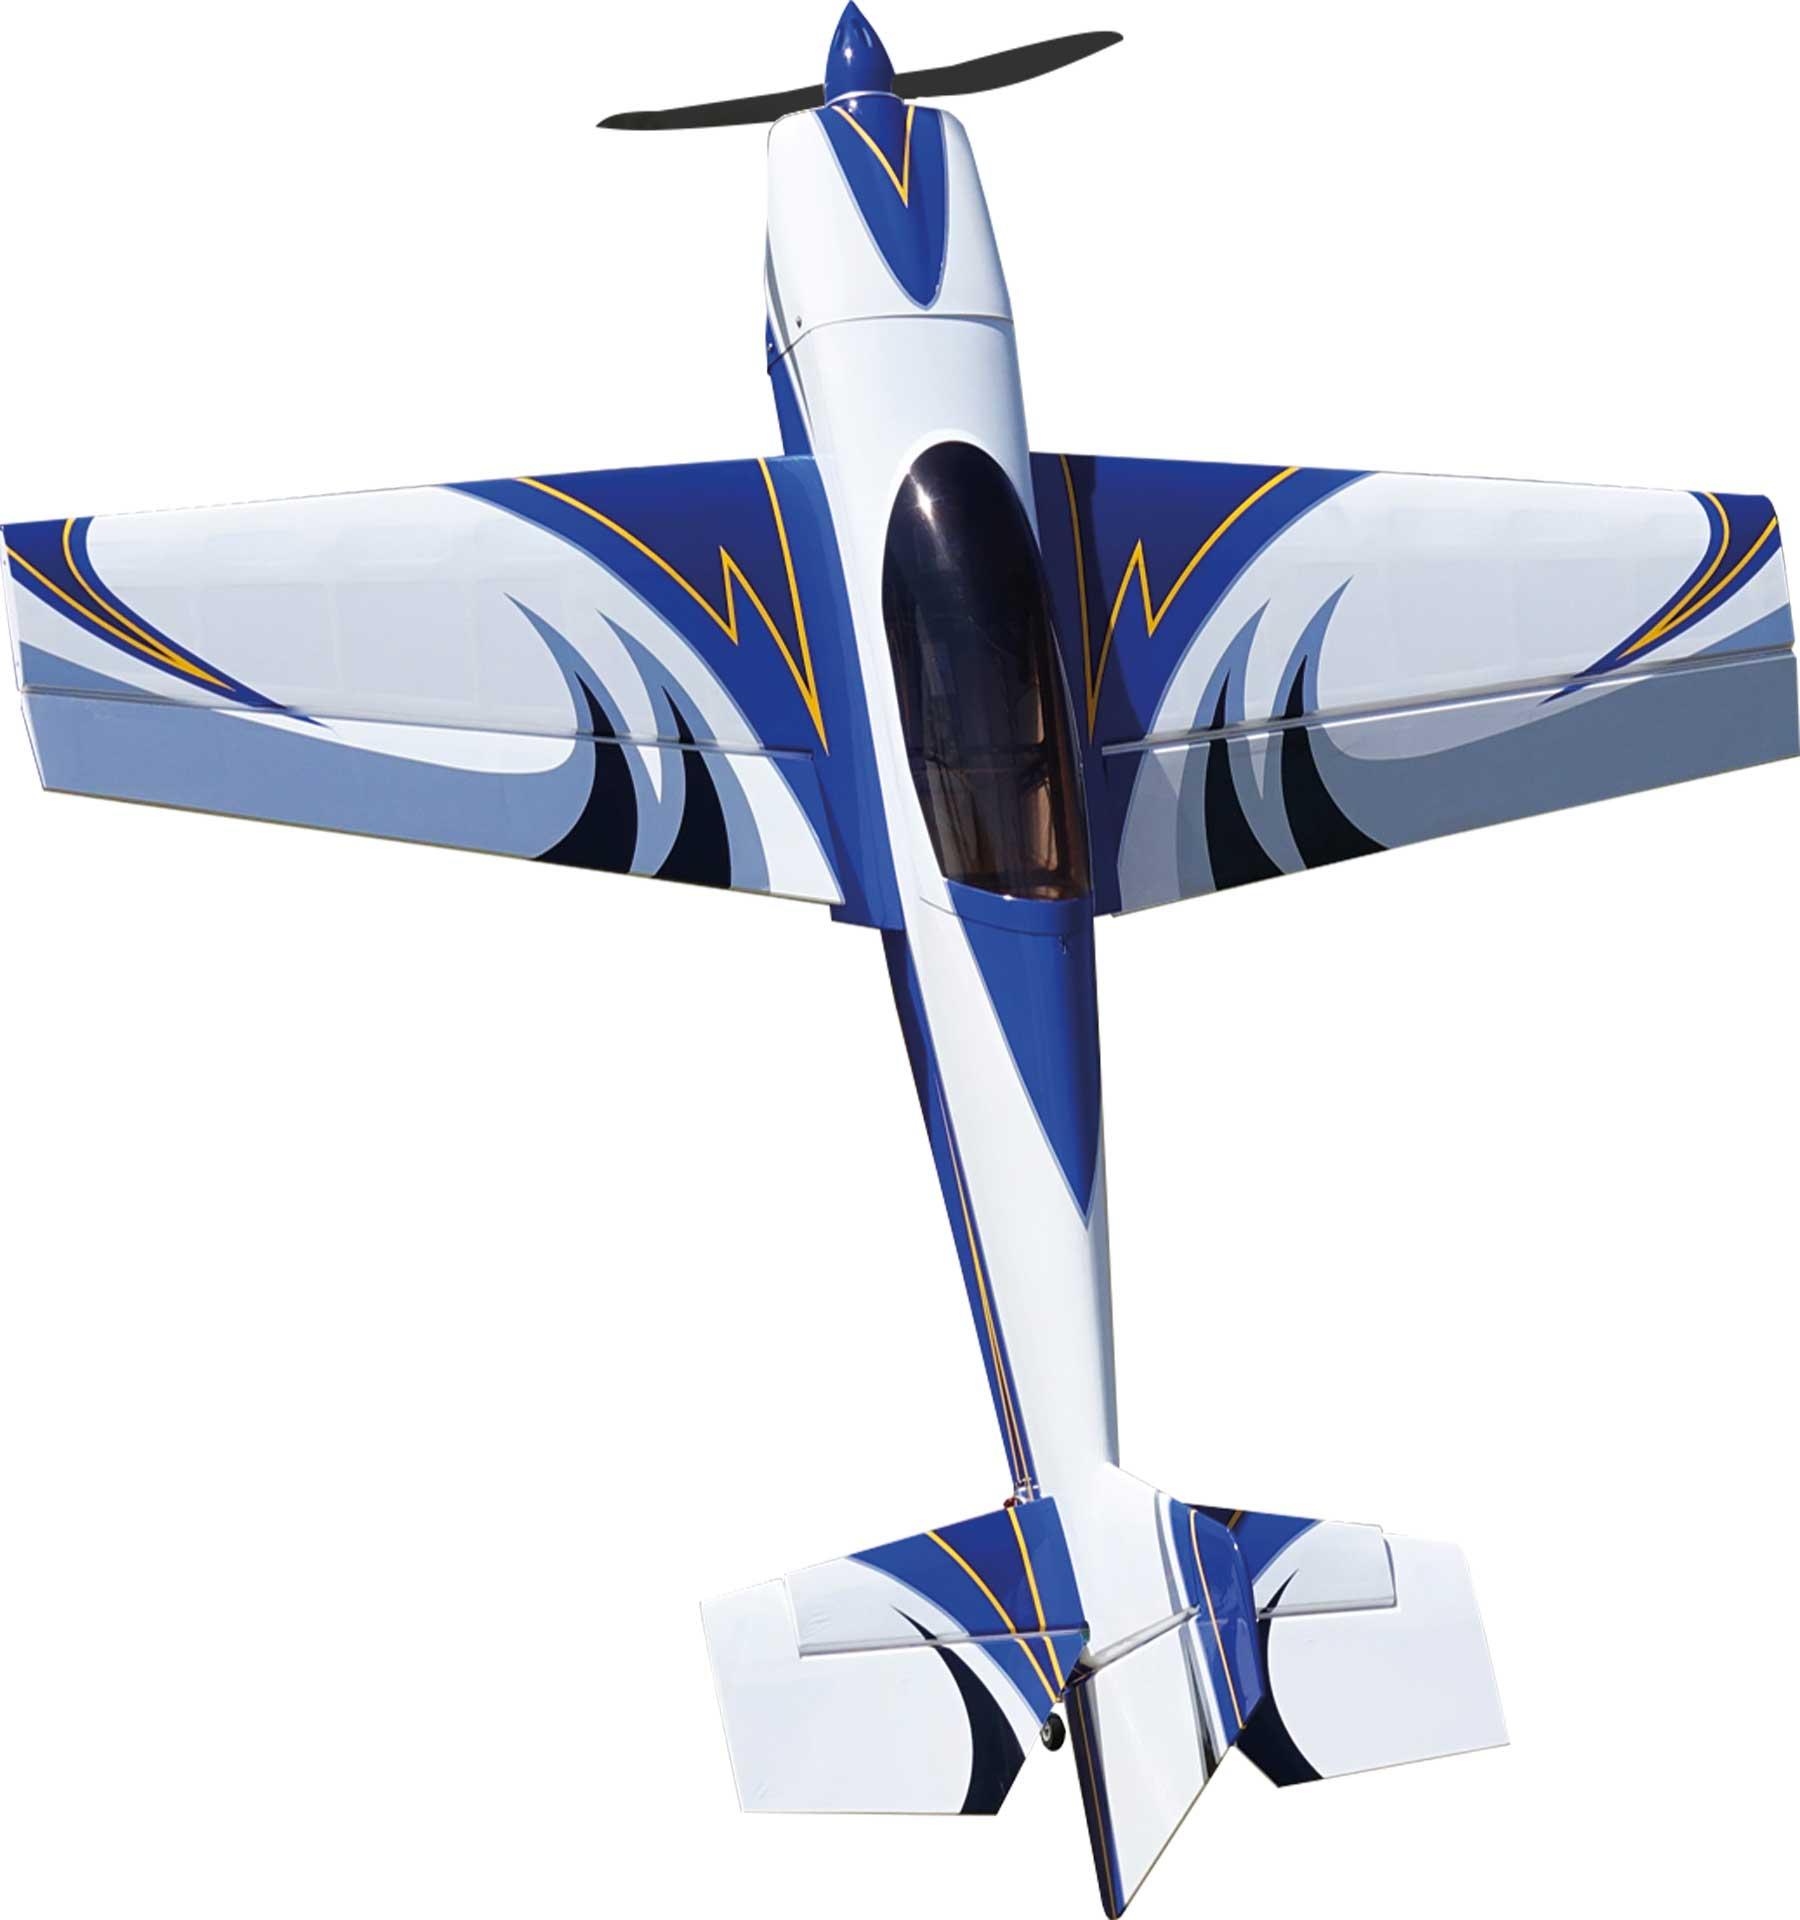 "EXTREMEFLIGHT-RC Extra NG 60""  blau / weiss ARF"